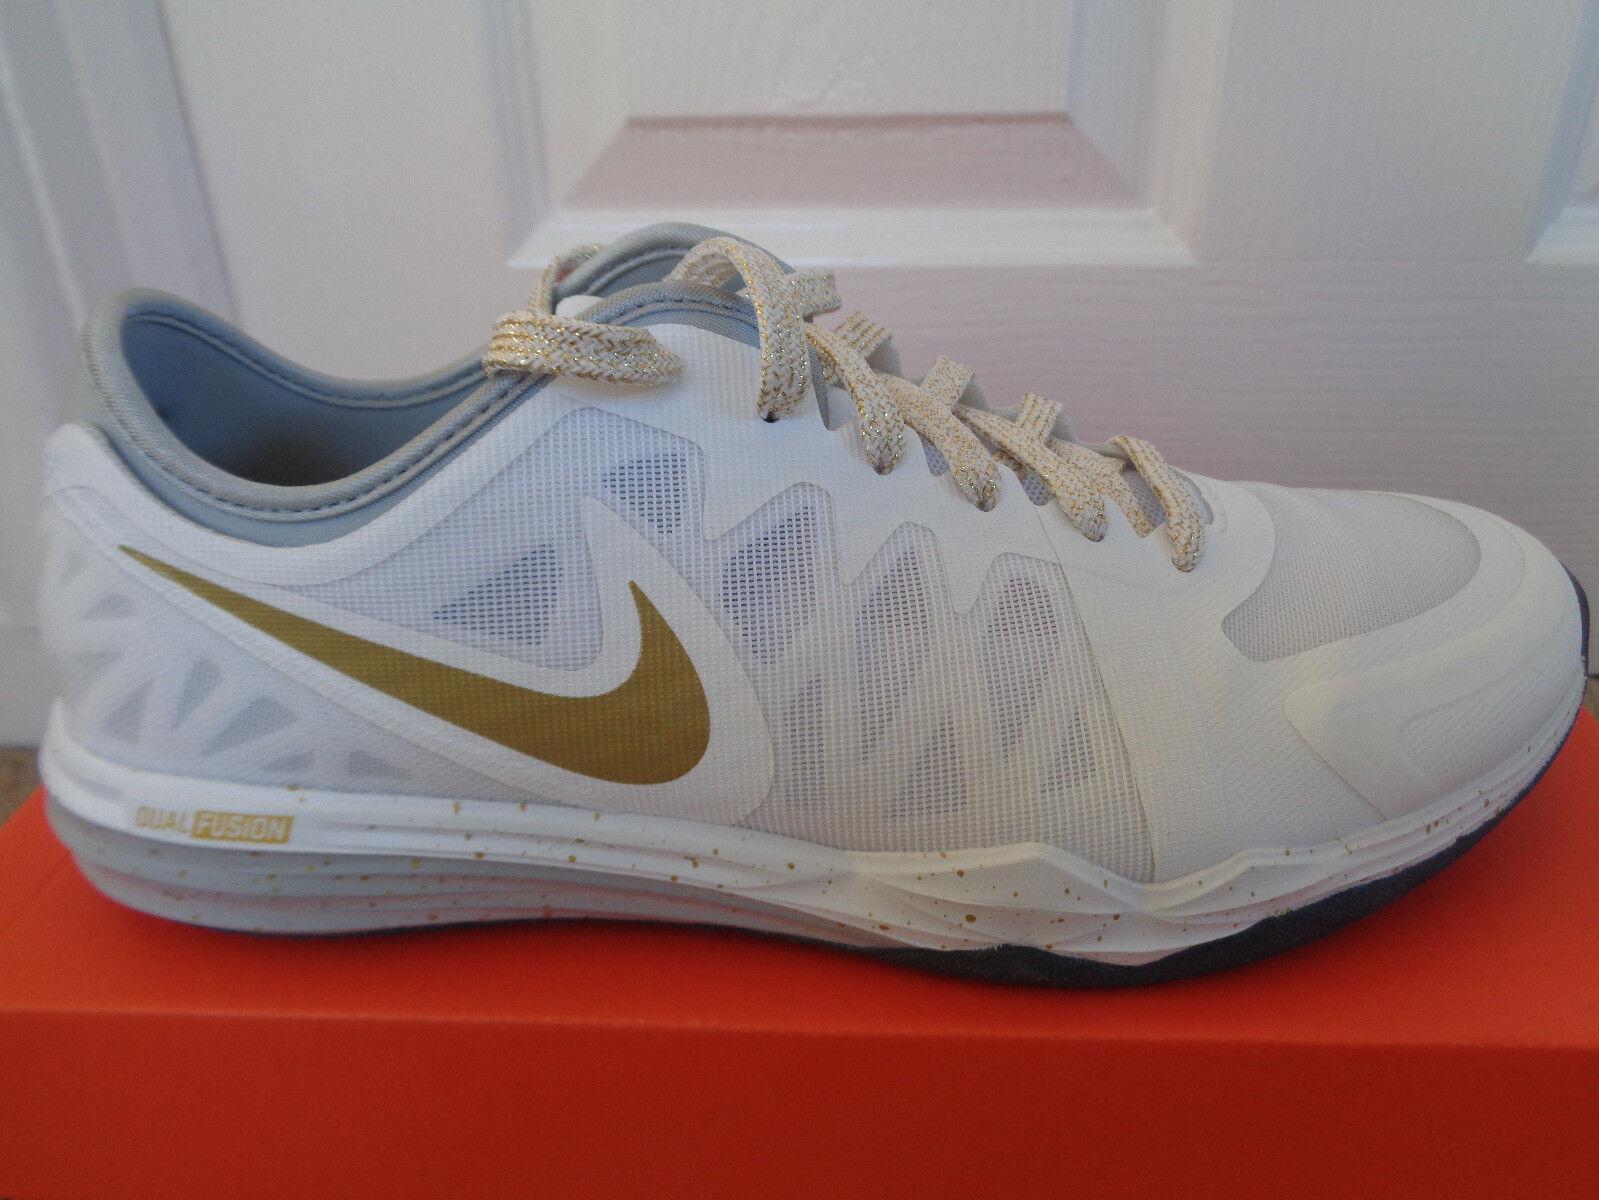 Nike Dual trainers Fusion TR 3 Print trainers Dual 704941 103 uk 4.5 eu 38.5 us 7 NEW+BOX 8dde66